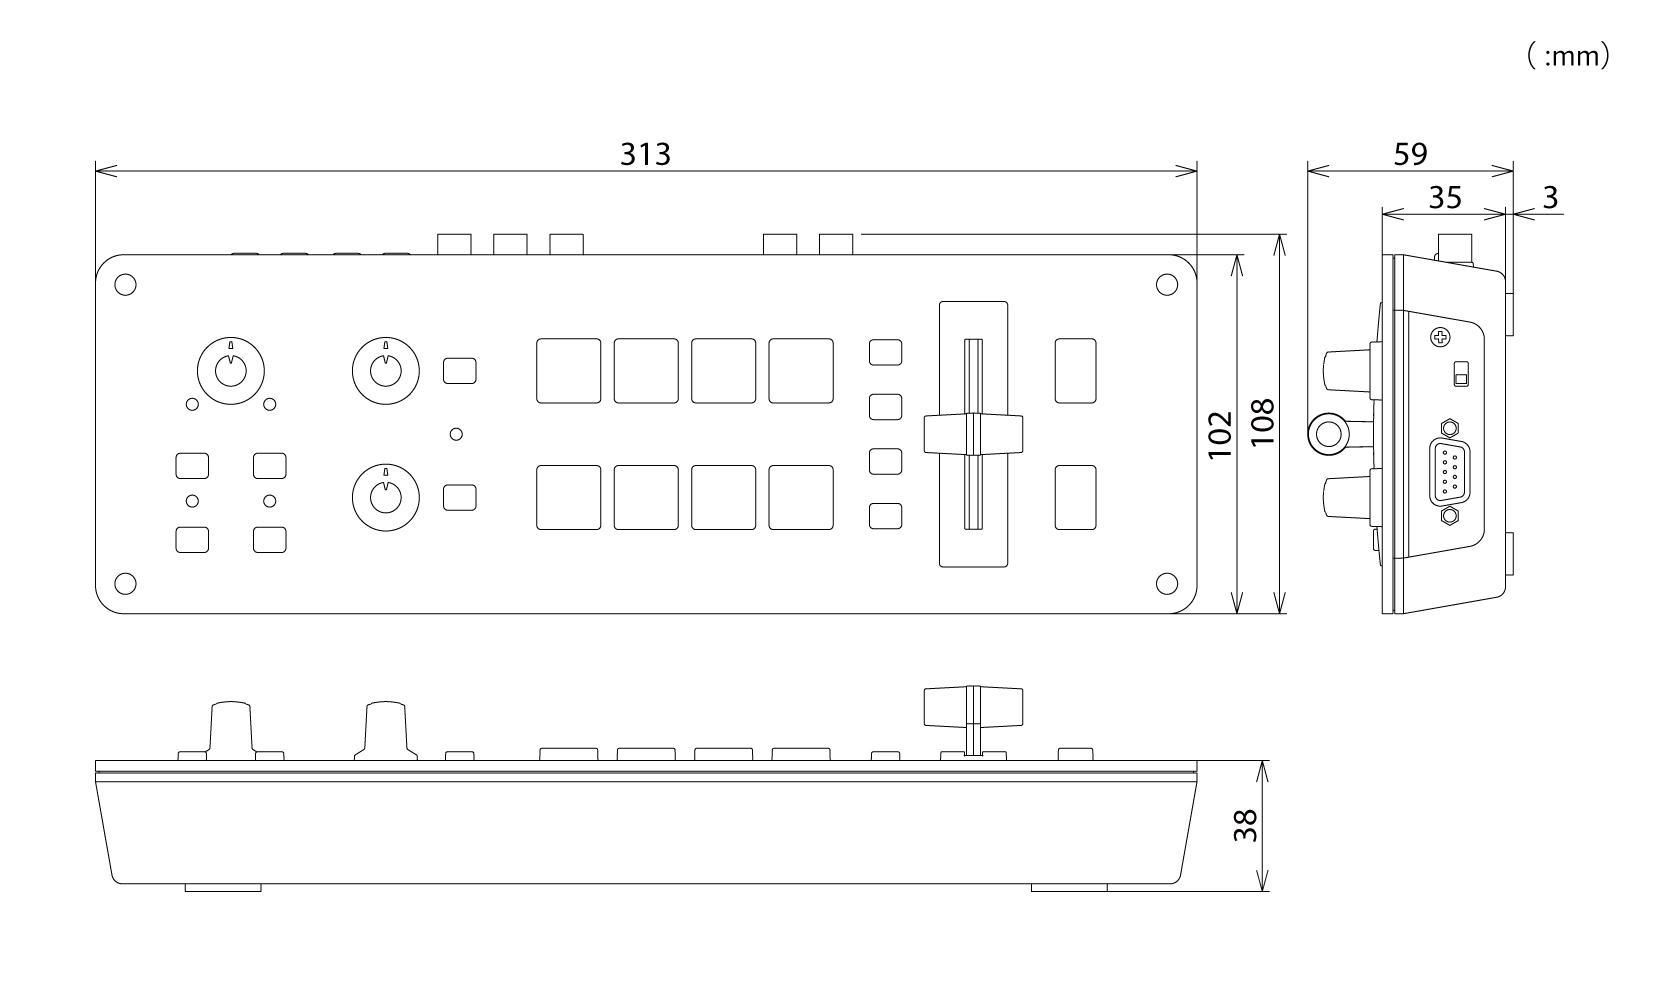 Roland Pro A V 1sdi 3g Sdi Video Switcher Simple 3 Channels Mini Mixer Circuit Diagram Block Cad Data